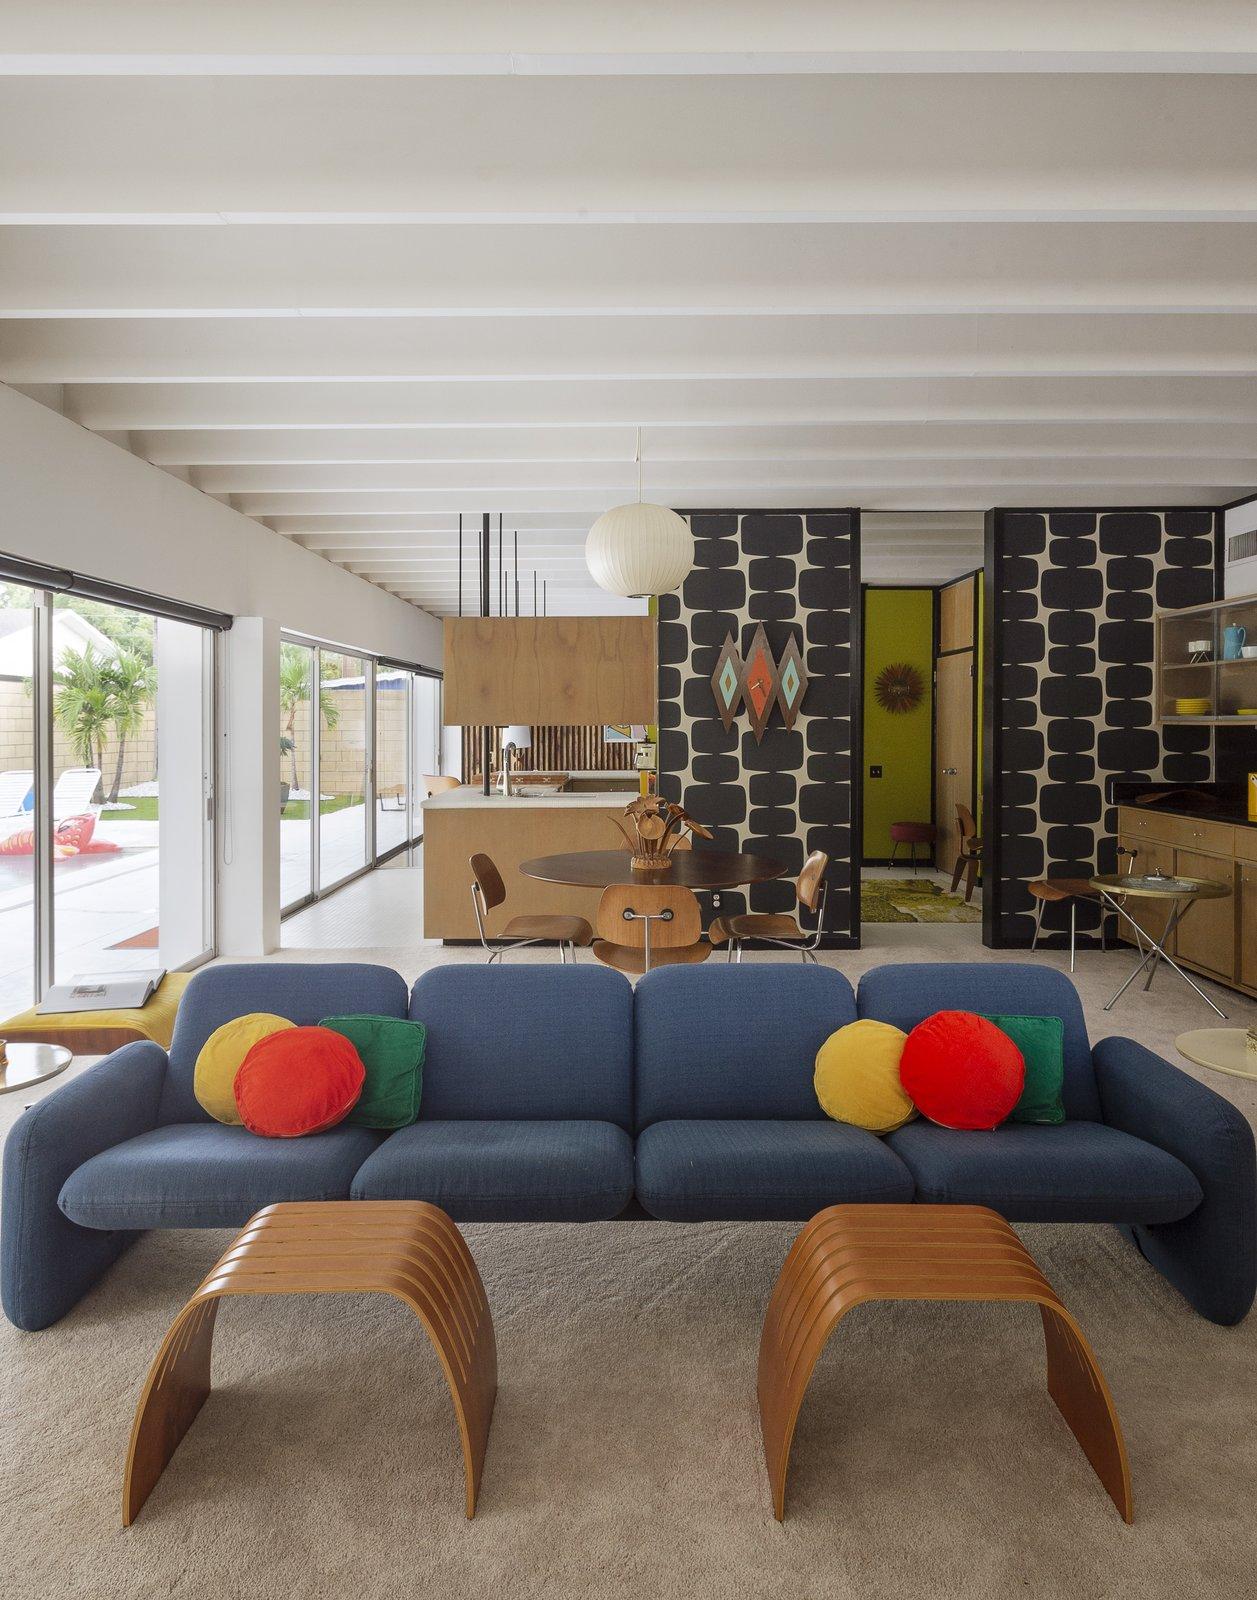 Ellison Residence by Gene Leedy living room